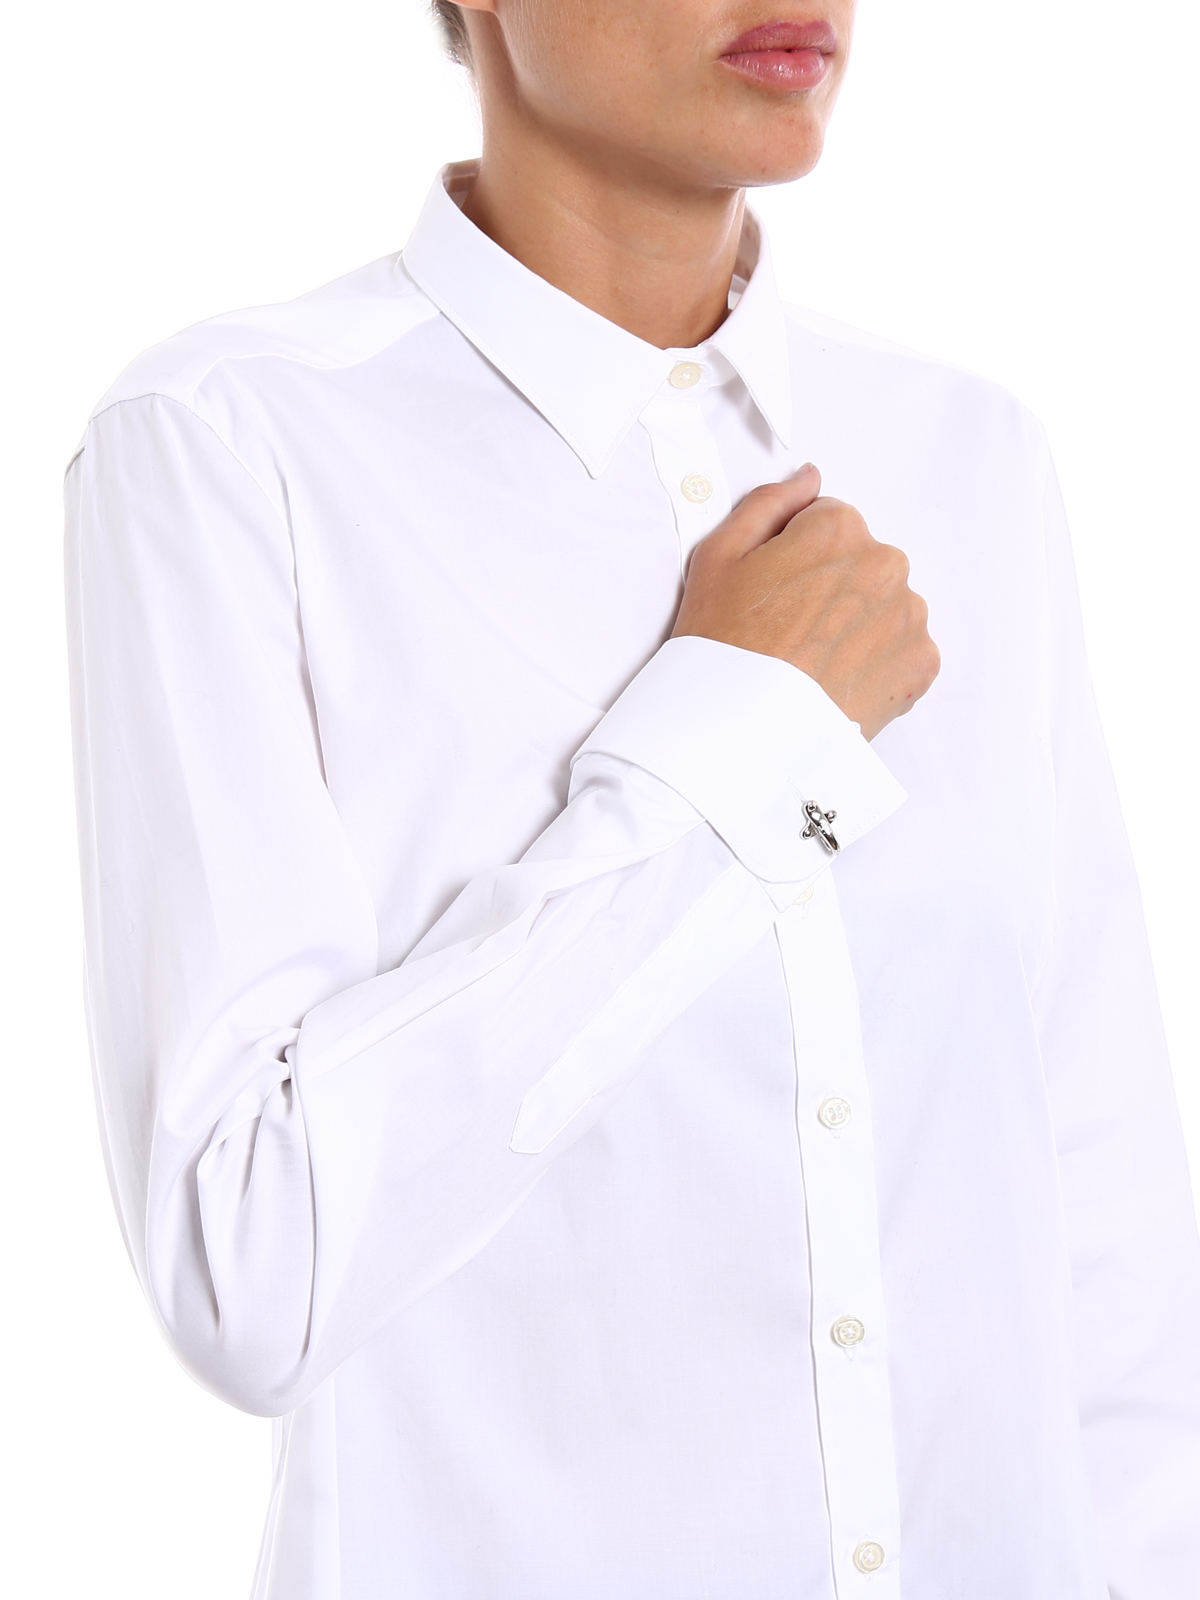 best service c1dcb f4a1b Fay Gemelli Con Camicia Ncwa135561sormb001 Camicie Gancio A ...